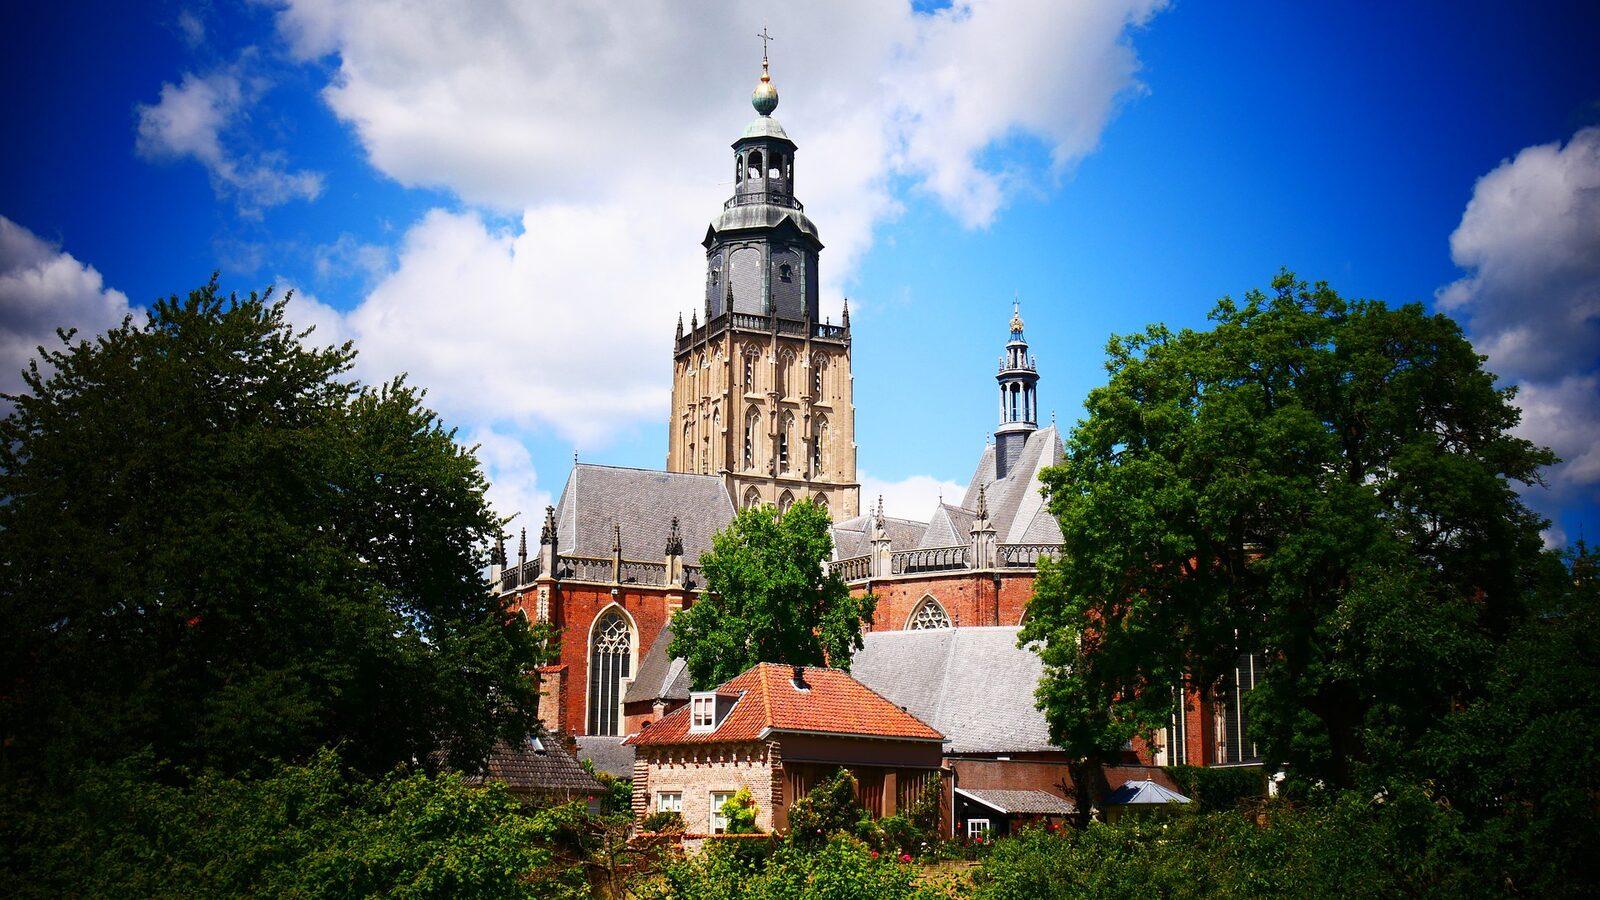 Hanseatic town of Zutphen